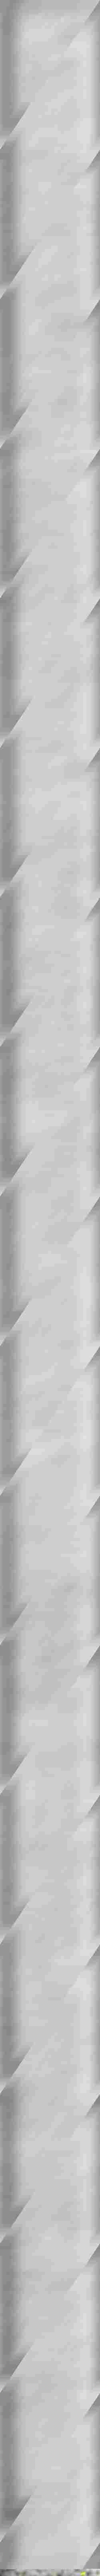 Paradyż Uniwersalna Listwa Szklana Silver Brokat